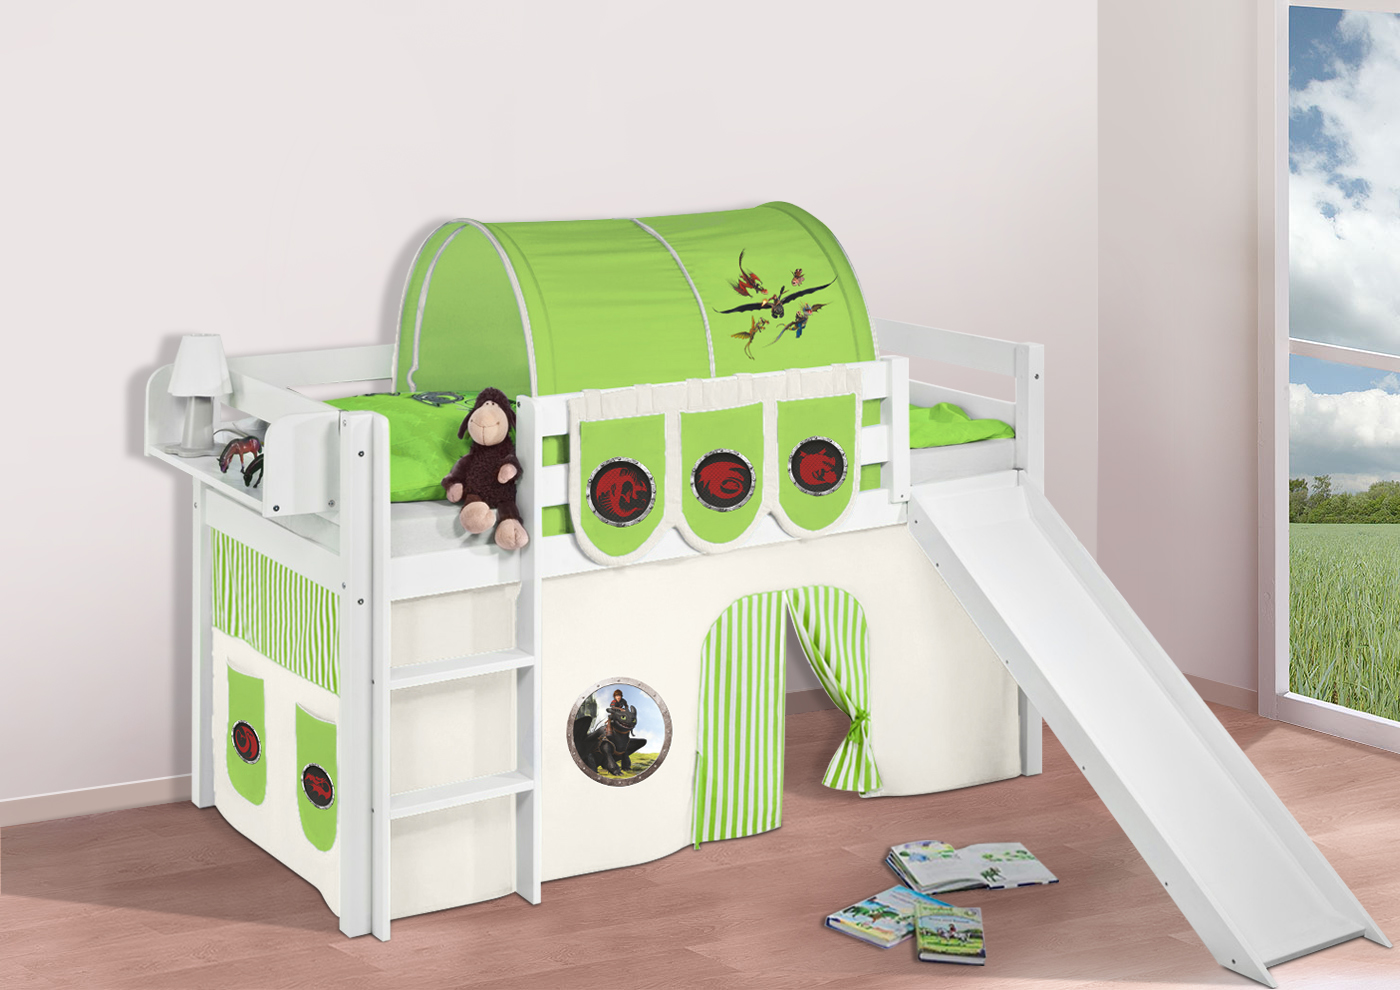 Spielbett-Hochbett-Kinderbett-Jelle-mit-Rutsche-BUCHE-Massivholz ...